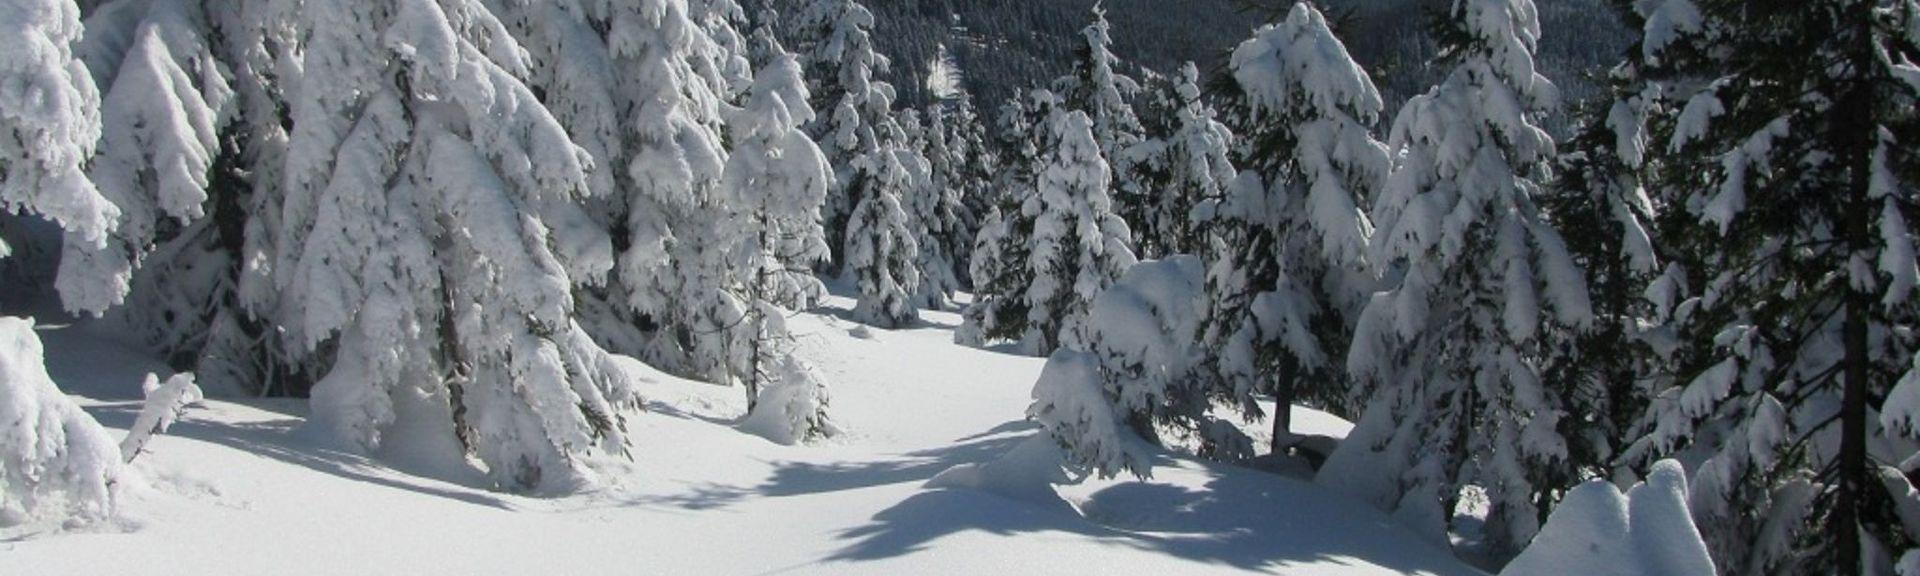 Rokytnice nad Jizerou, Liberec (region), Czech Republic